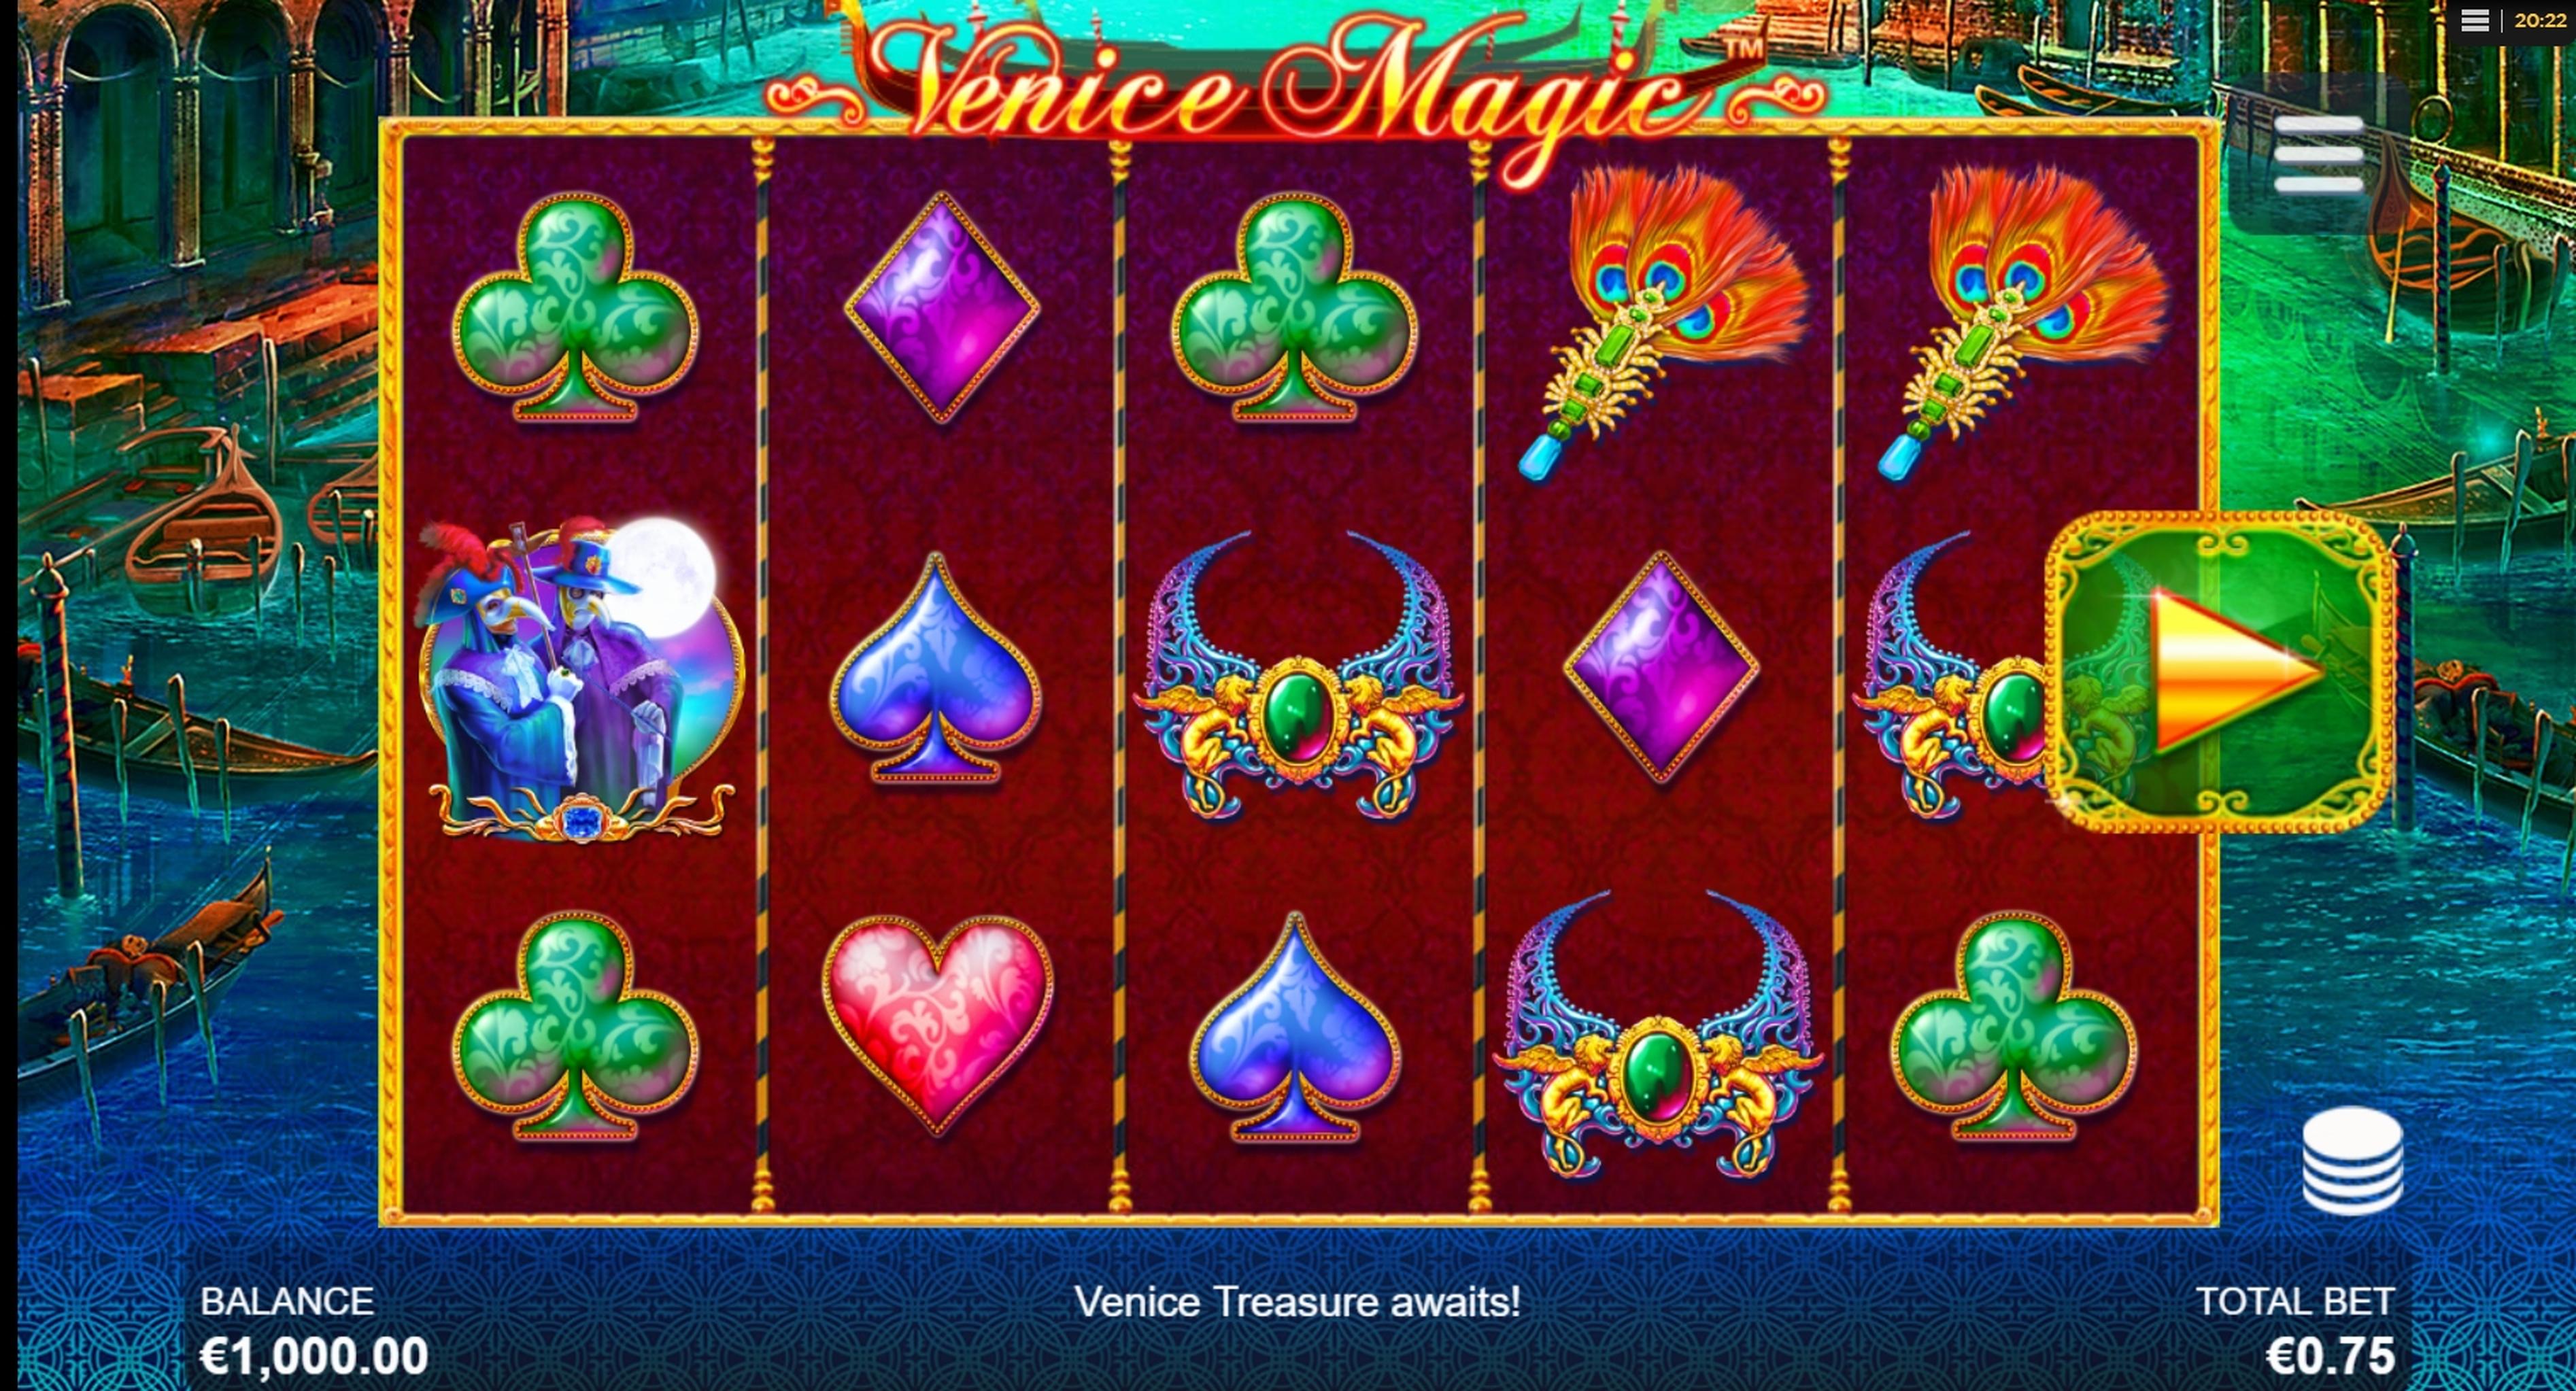 Venice Magic Demo Slot